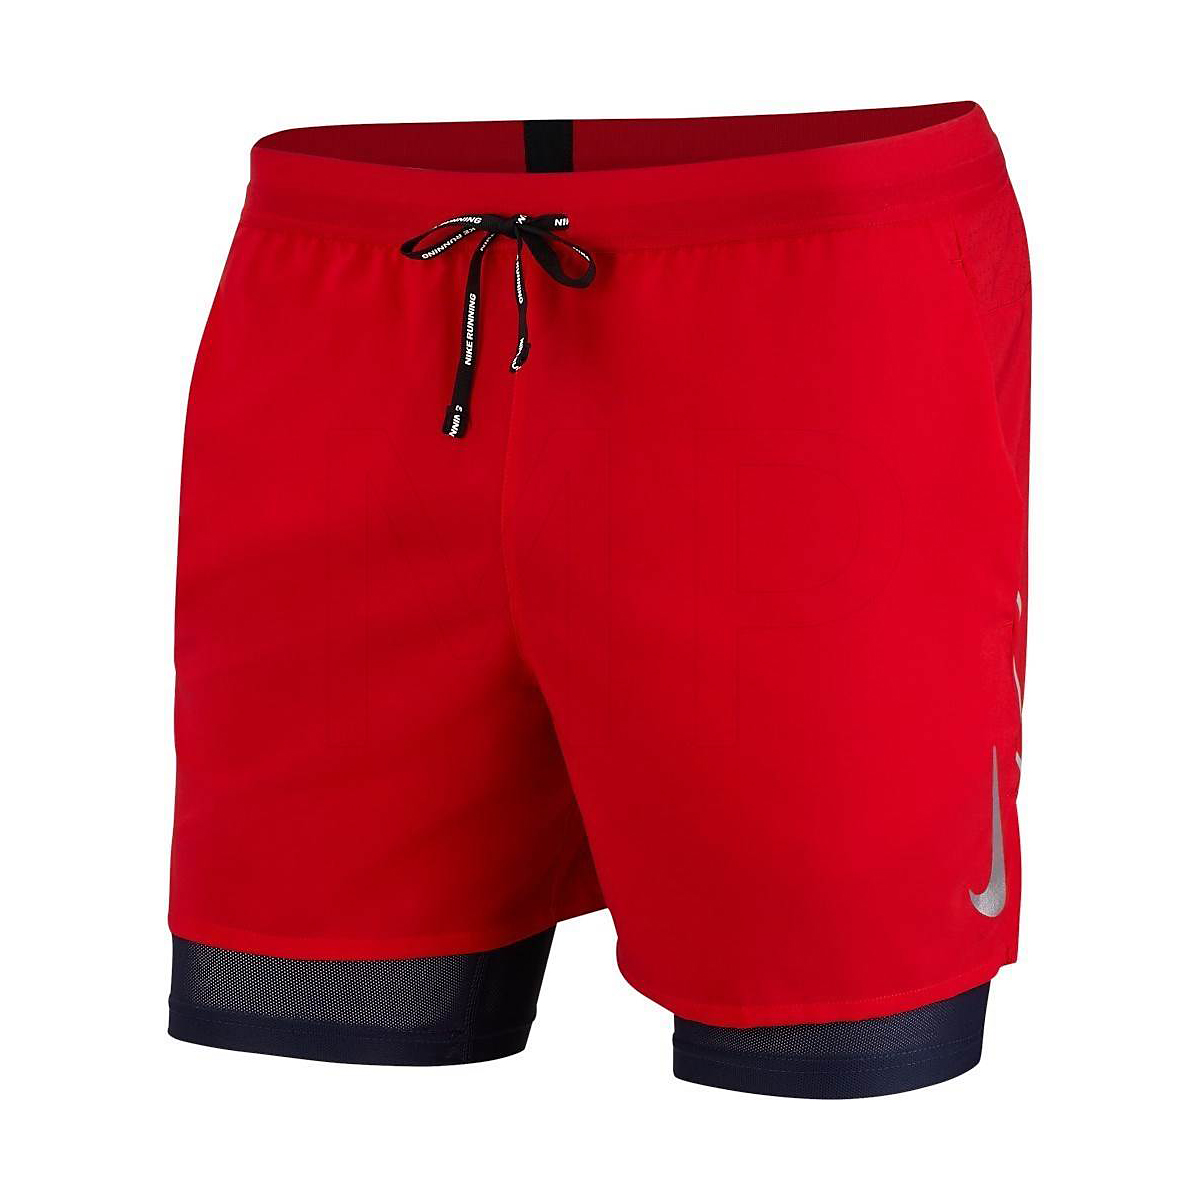 "Men's Nike Dri-FIT Flex Stride 7"" 2-in-1 Shorts - Color: University Red - Size: S, University Red, large, image 1"